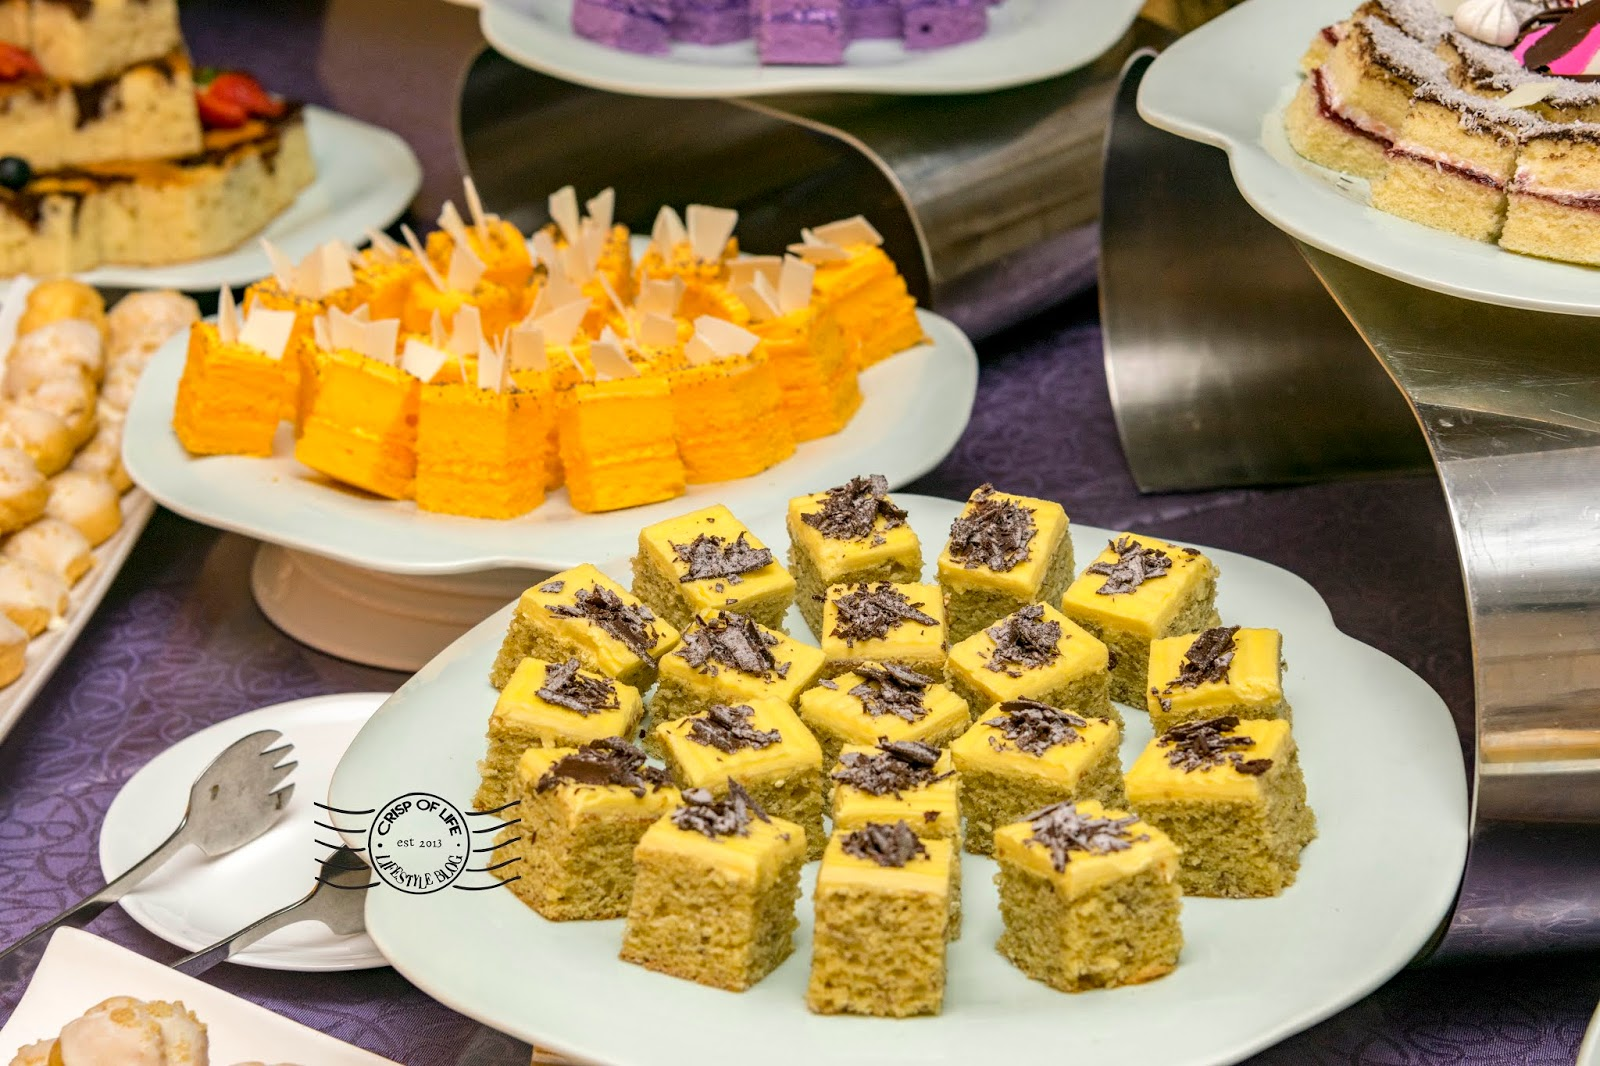 Buffet Ramadhan Dulang Pak Beh 2018 @ Iconic Hotel, Bukit Mertajam, Penang